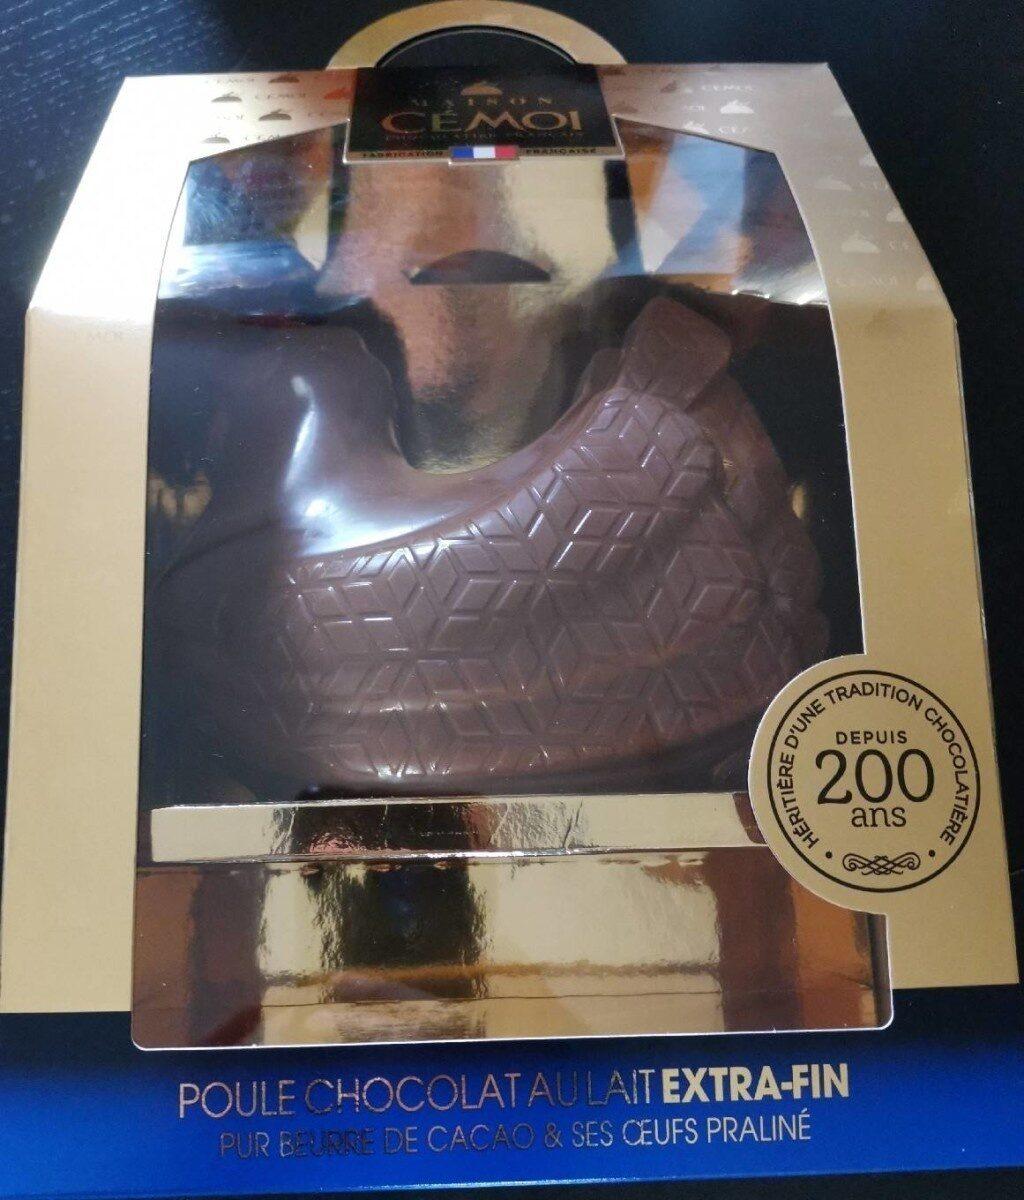 Poule chocolat - Prodotto - fr